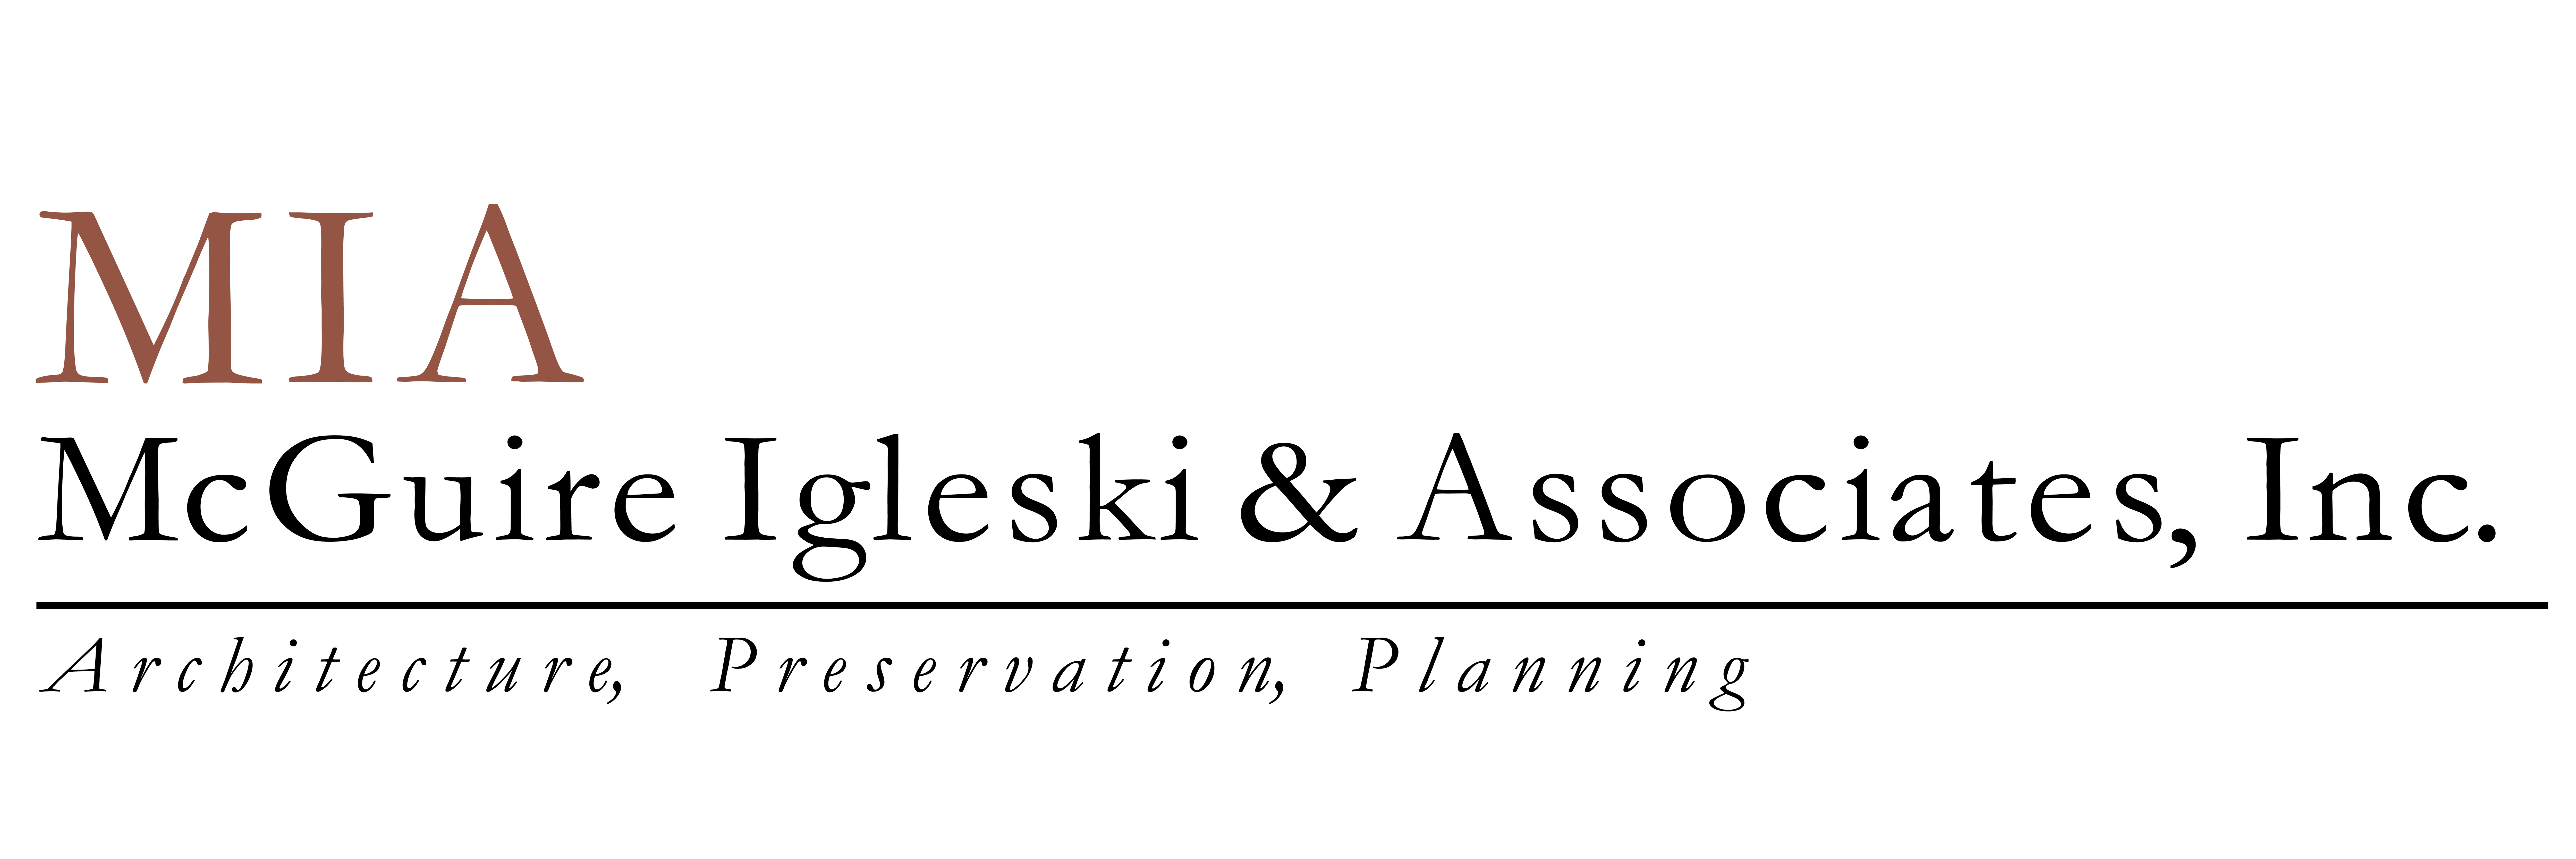 Mcguire Igleski Associates logo